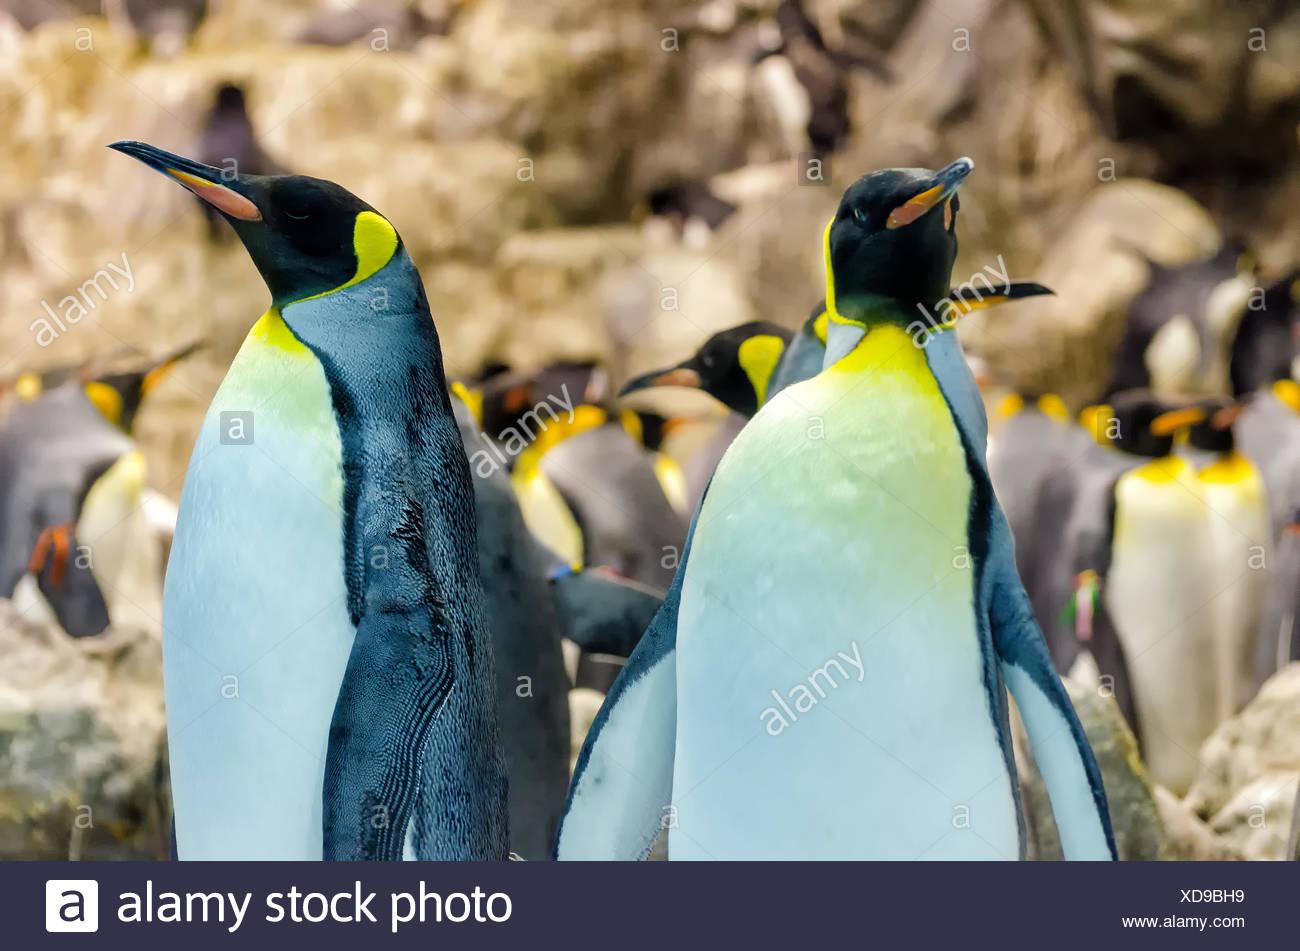 king penguins - Stock Image